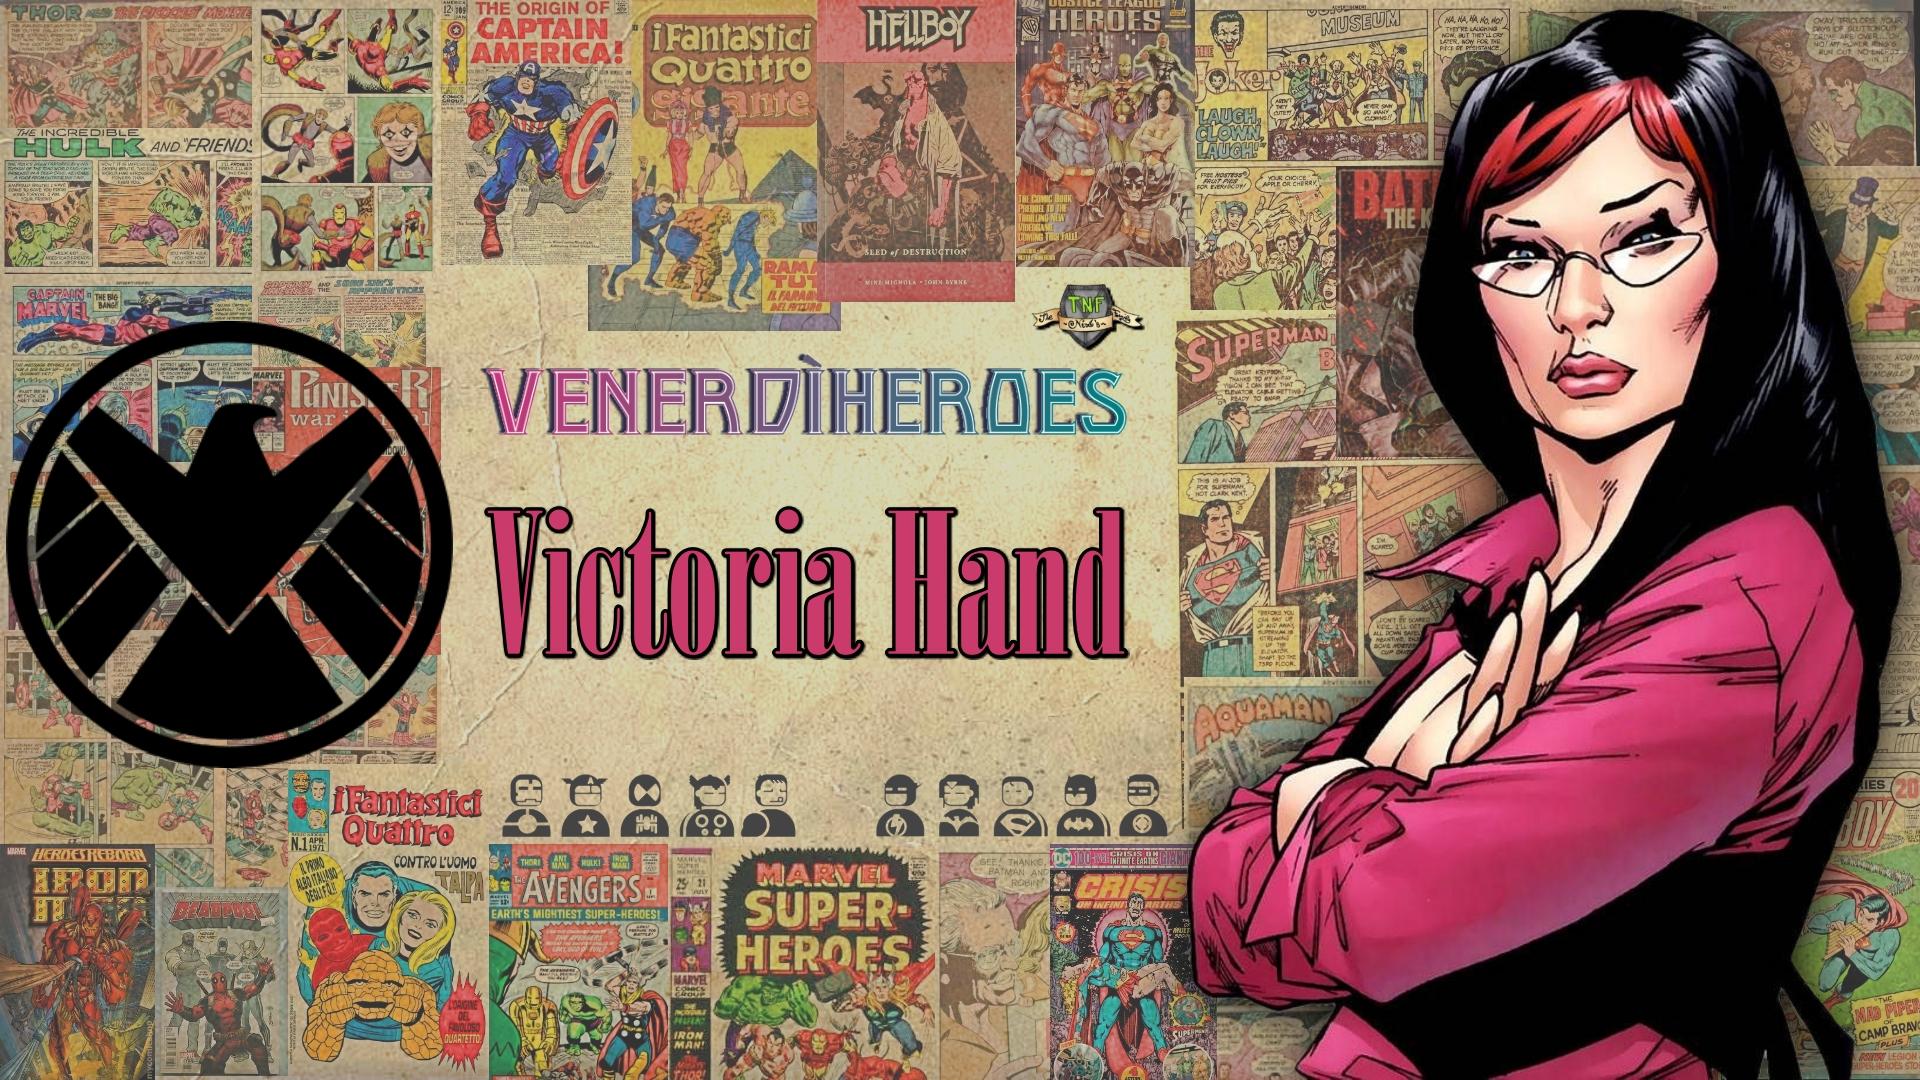 Victoria Hand